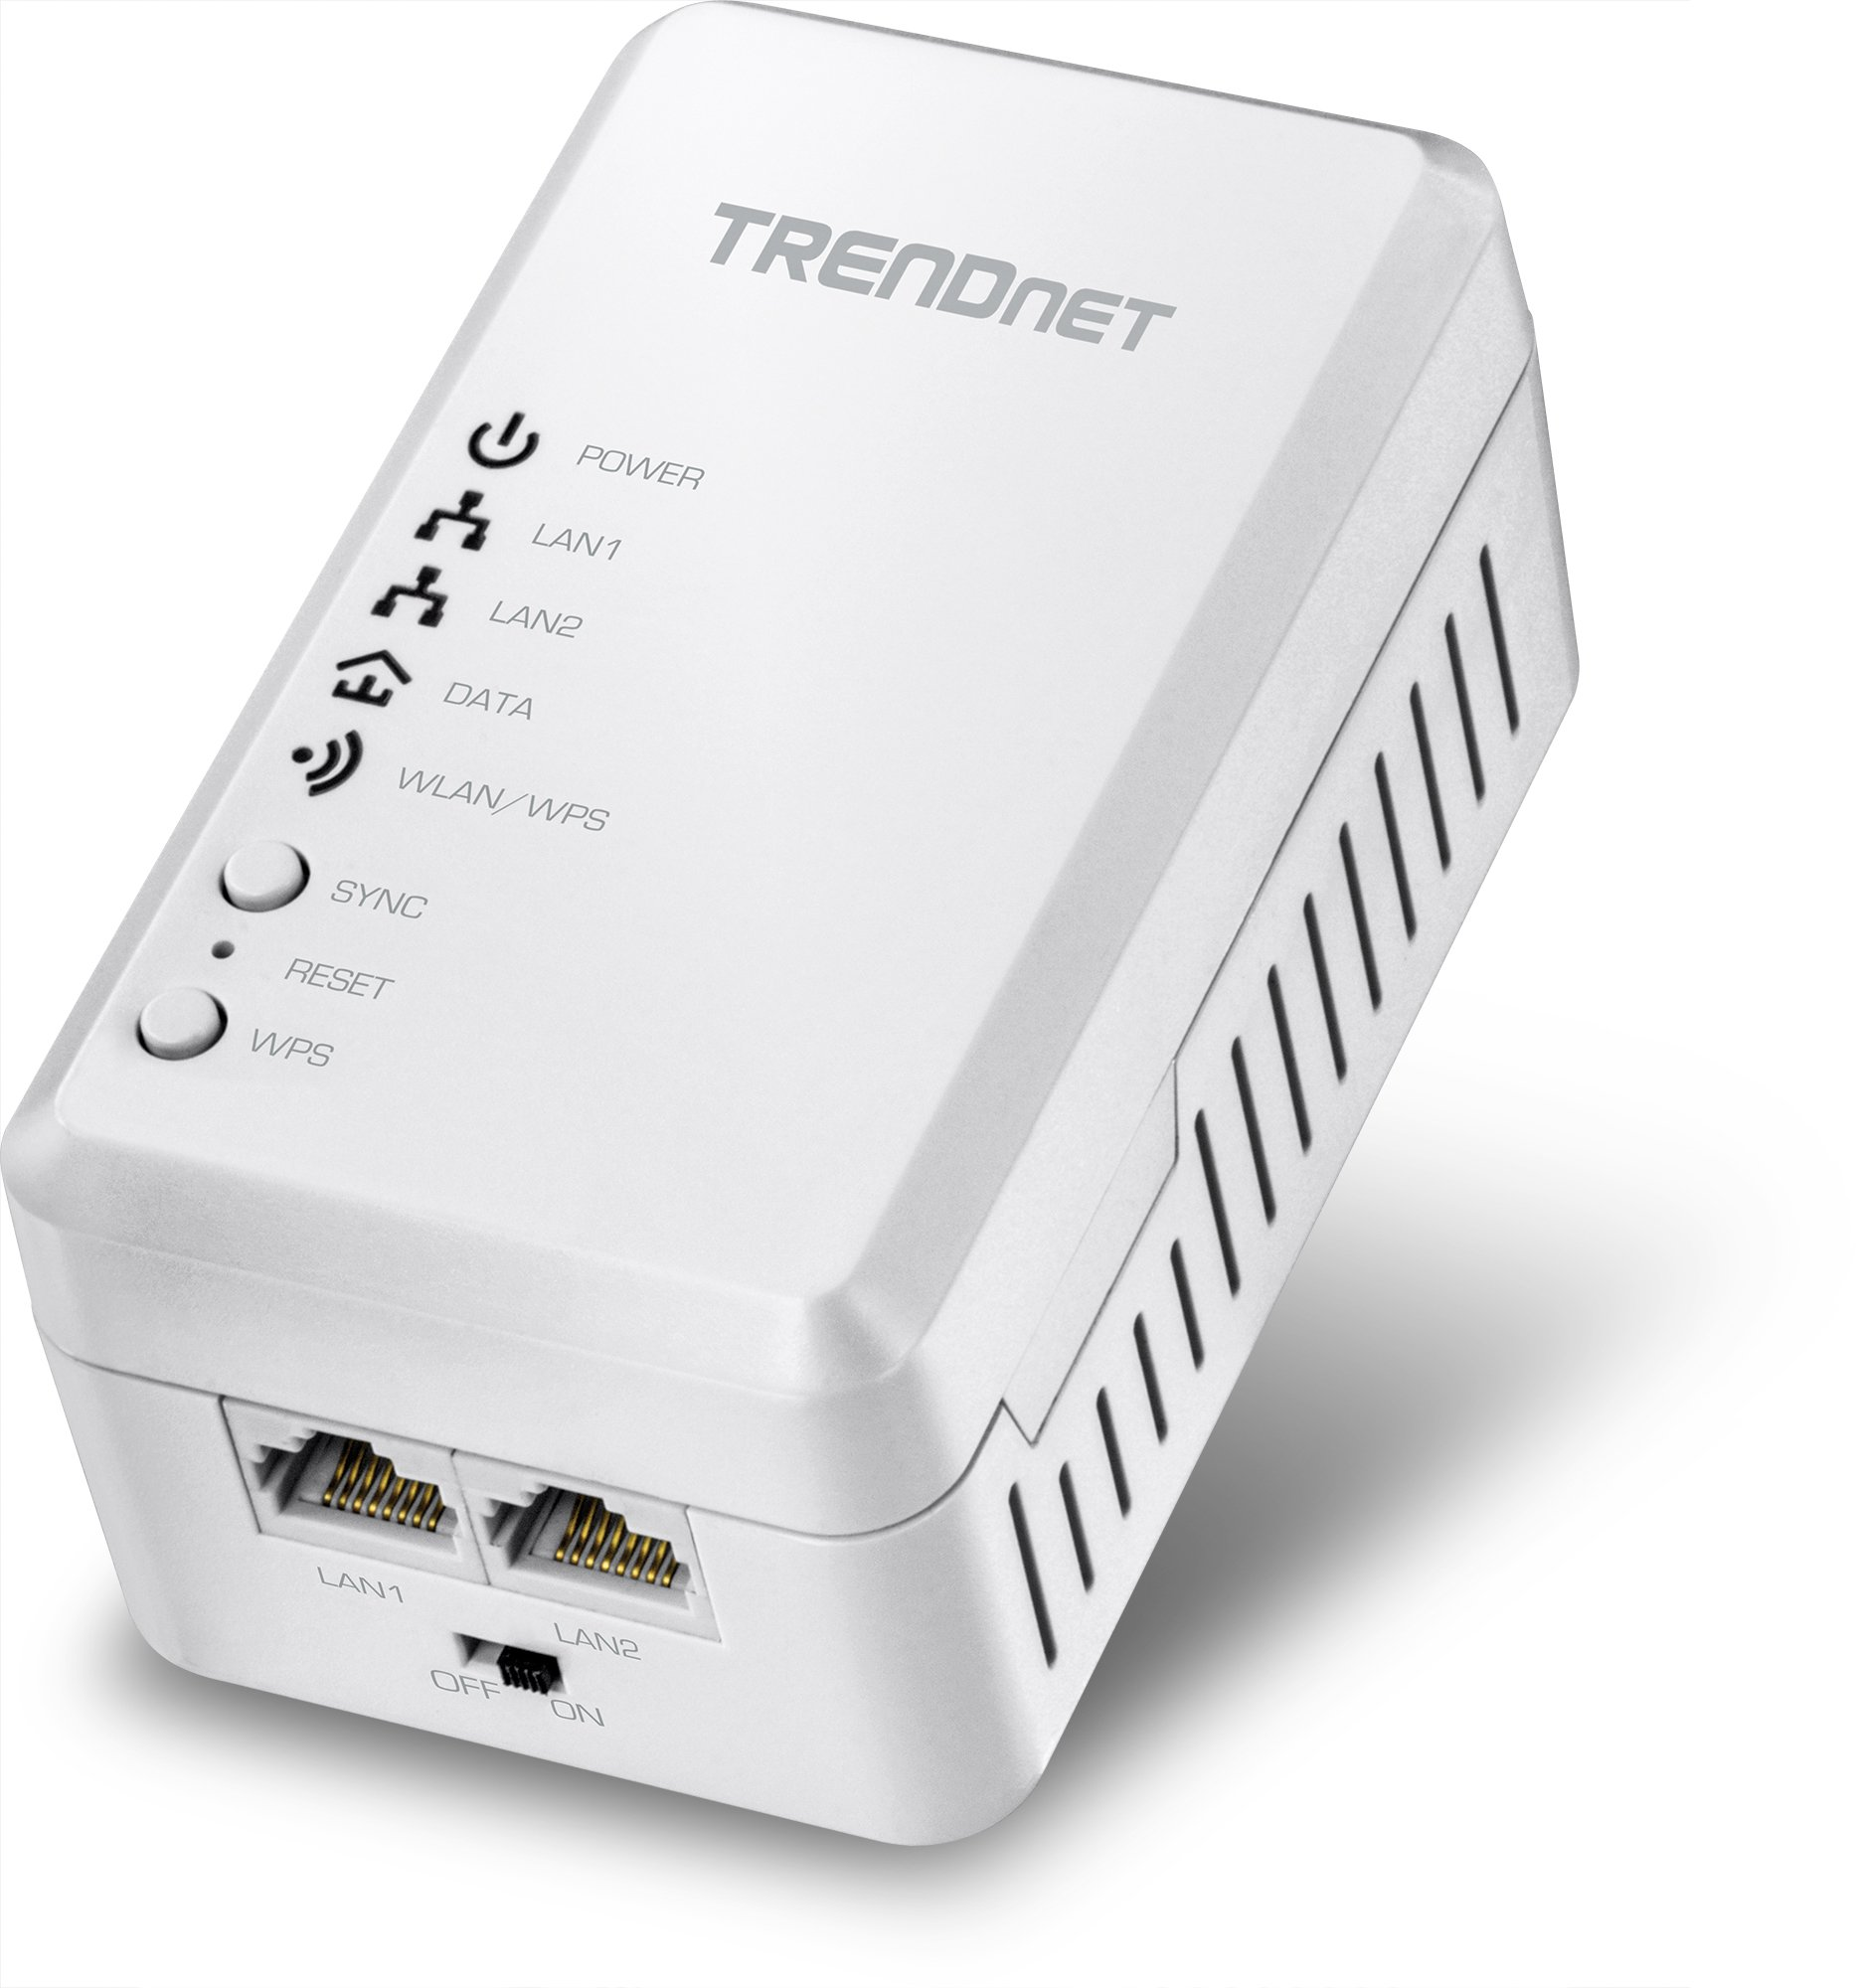 TRENDnet Powerline 500 AV Access Point WiFi Everywhere Wireless N300 Access Point, 500 AV Powerline and Wireless N 300, TPL-410AP by TRENDnet